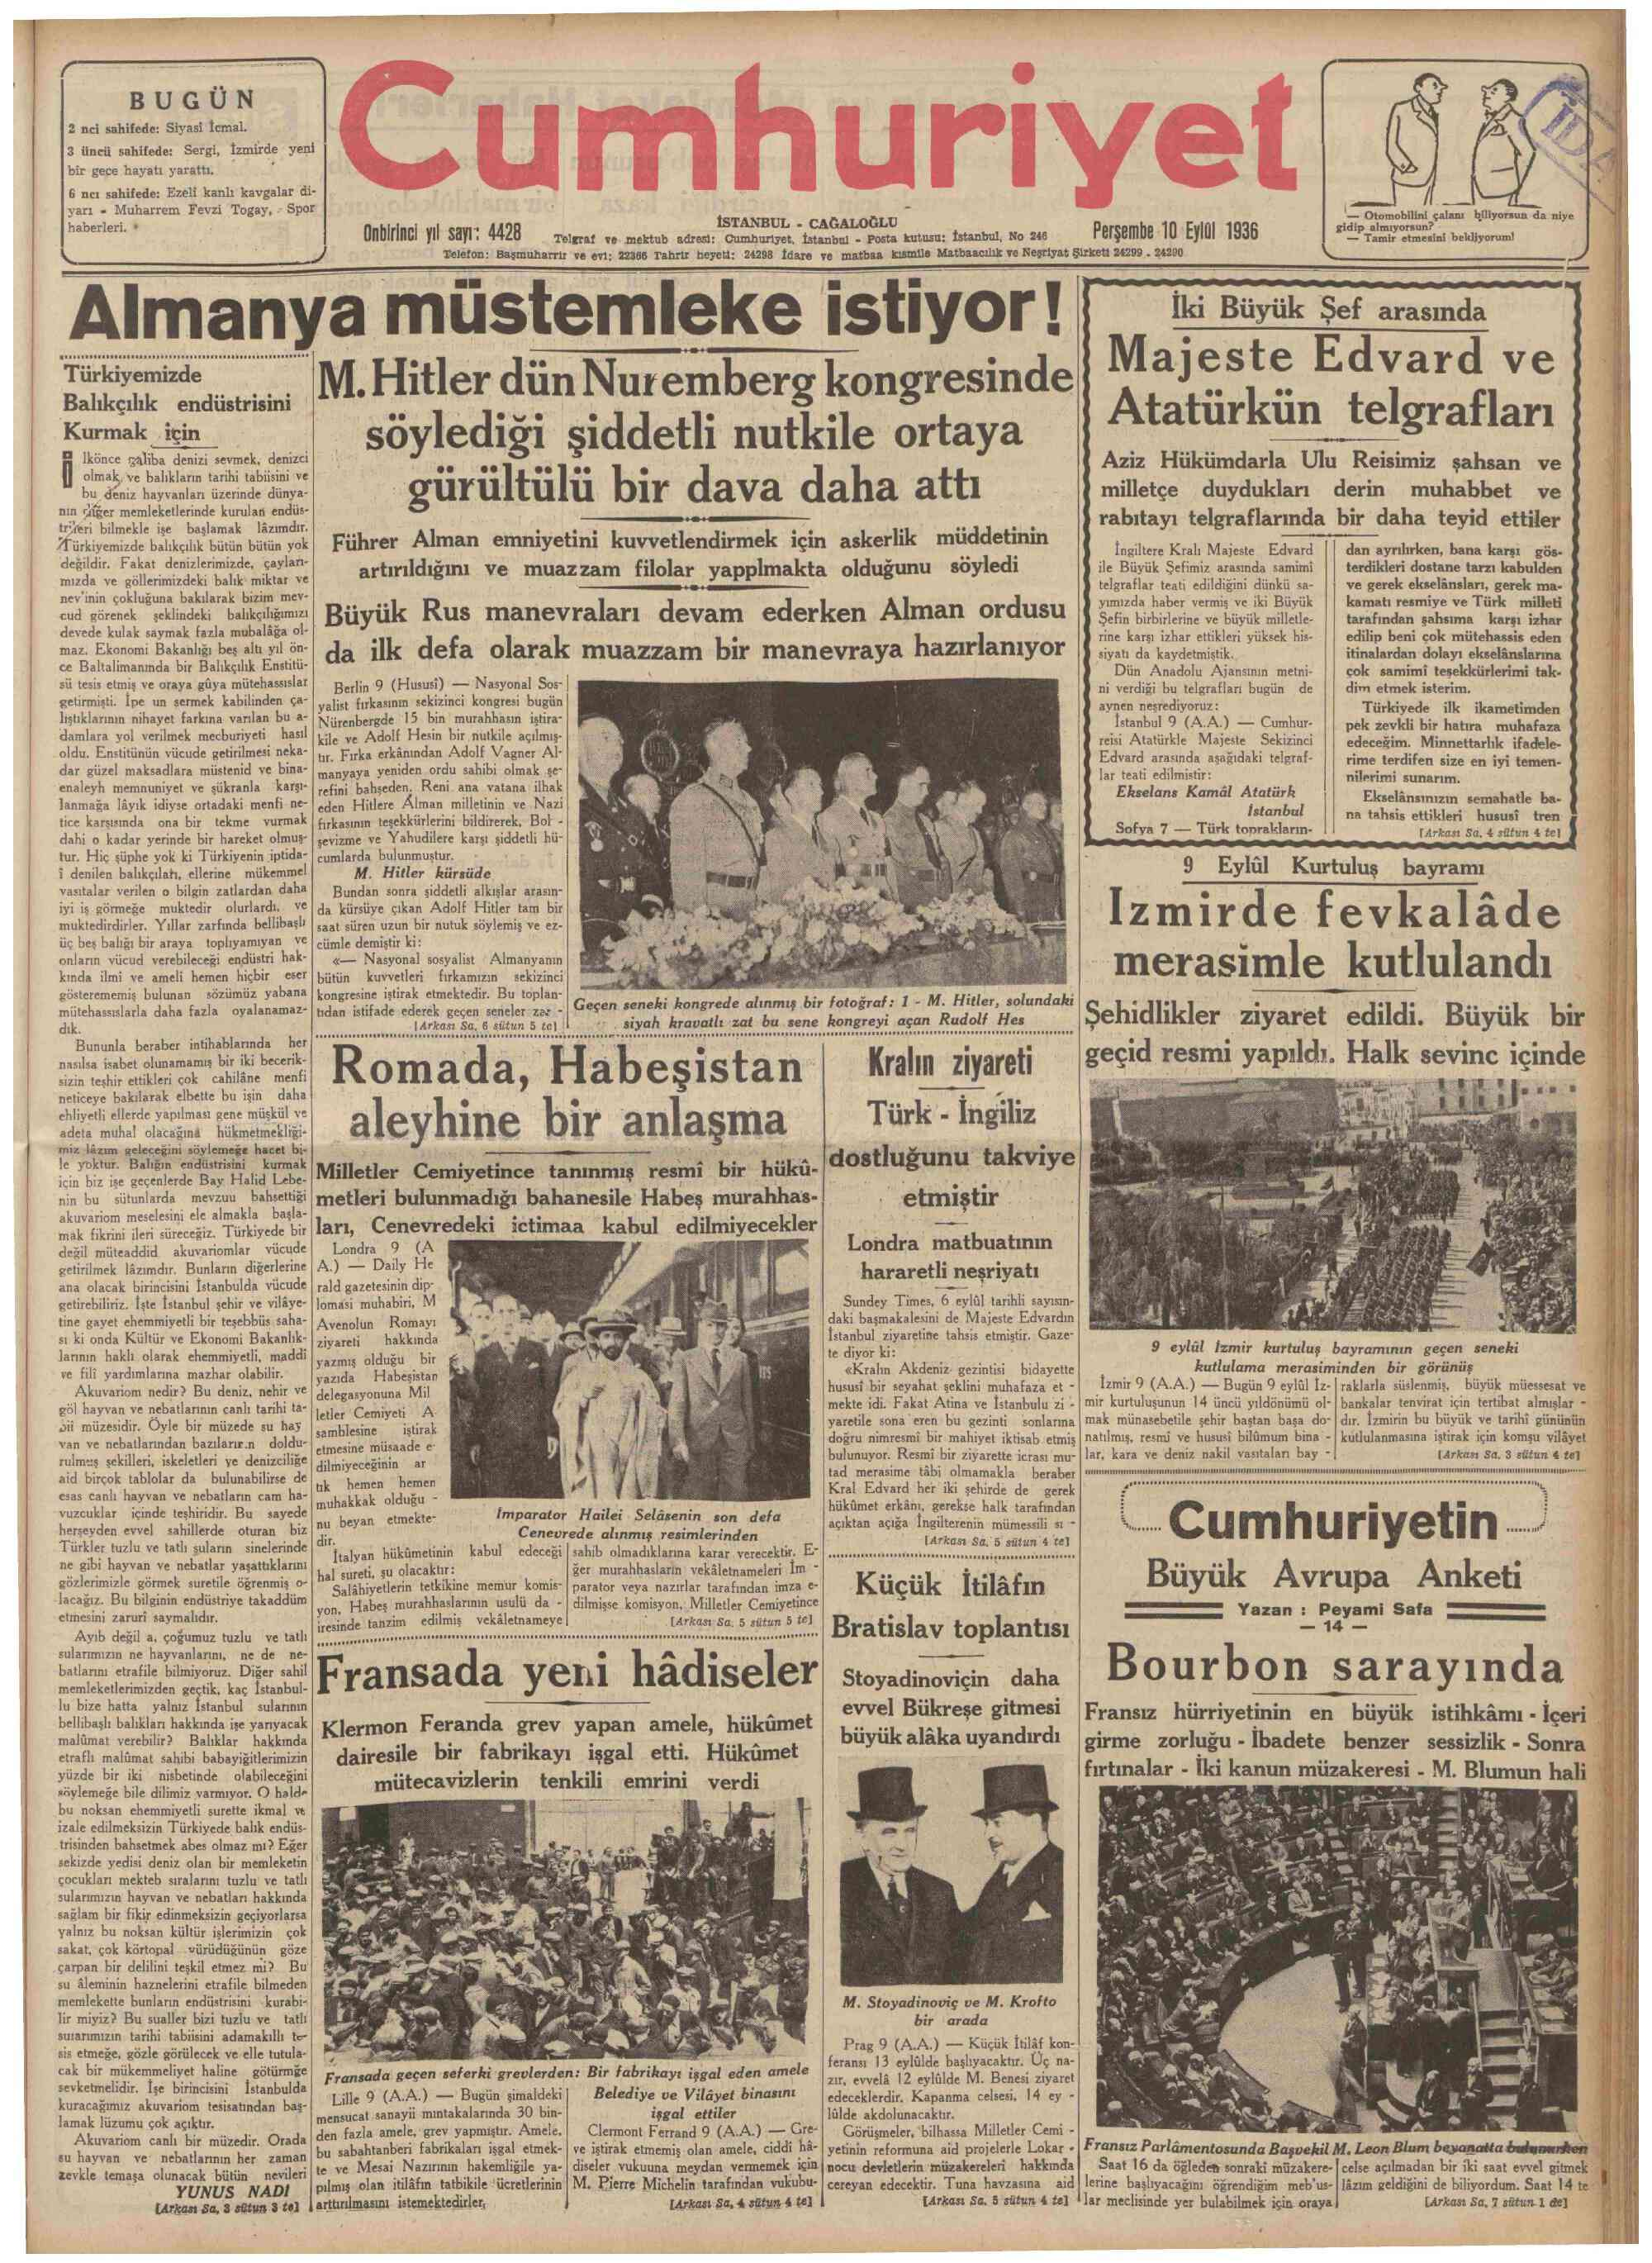 10 Eylül 1936 Tarihli Cumhuriyet Gazetesi Sayfa 1